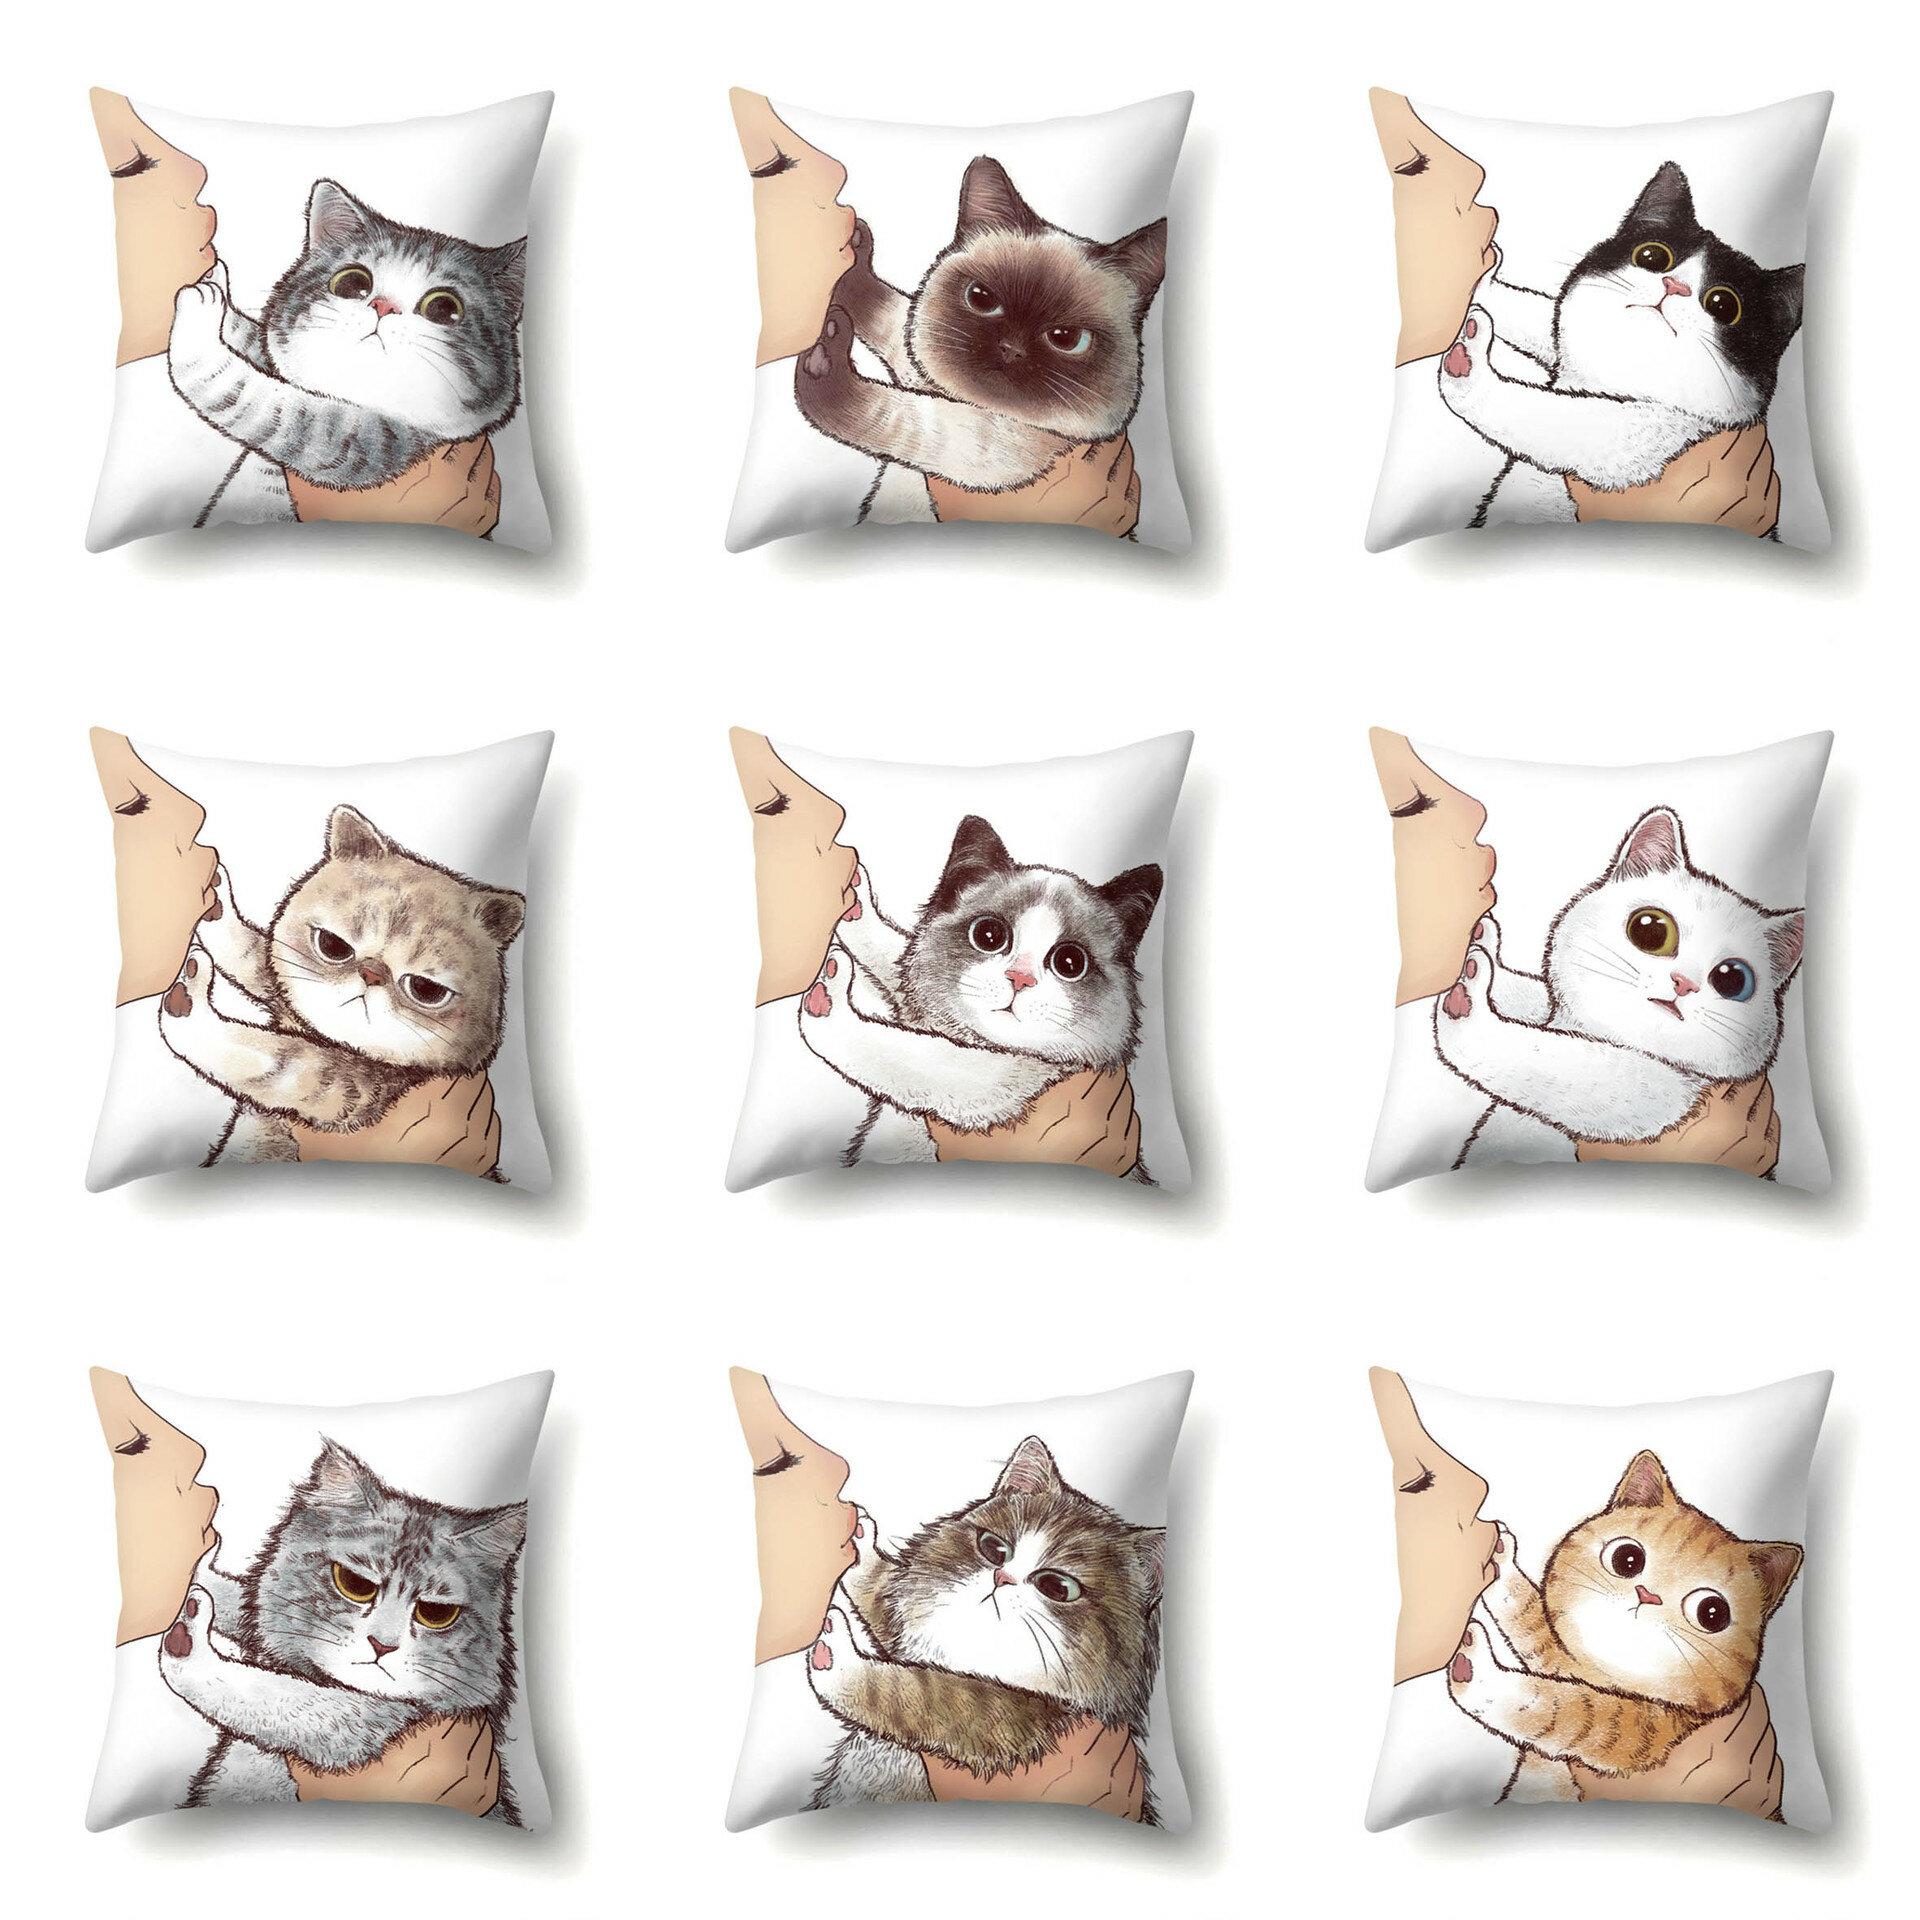 Cat Geometric Creative Single-sided Polyester Pillowcase Sofa Pillowcase Home Cushion Cover Living Room Bedroom Pillowca